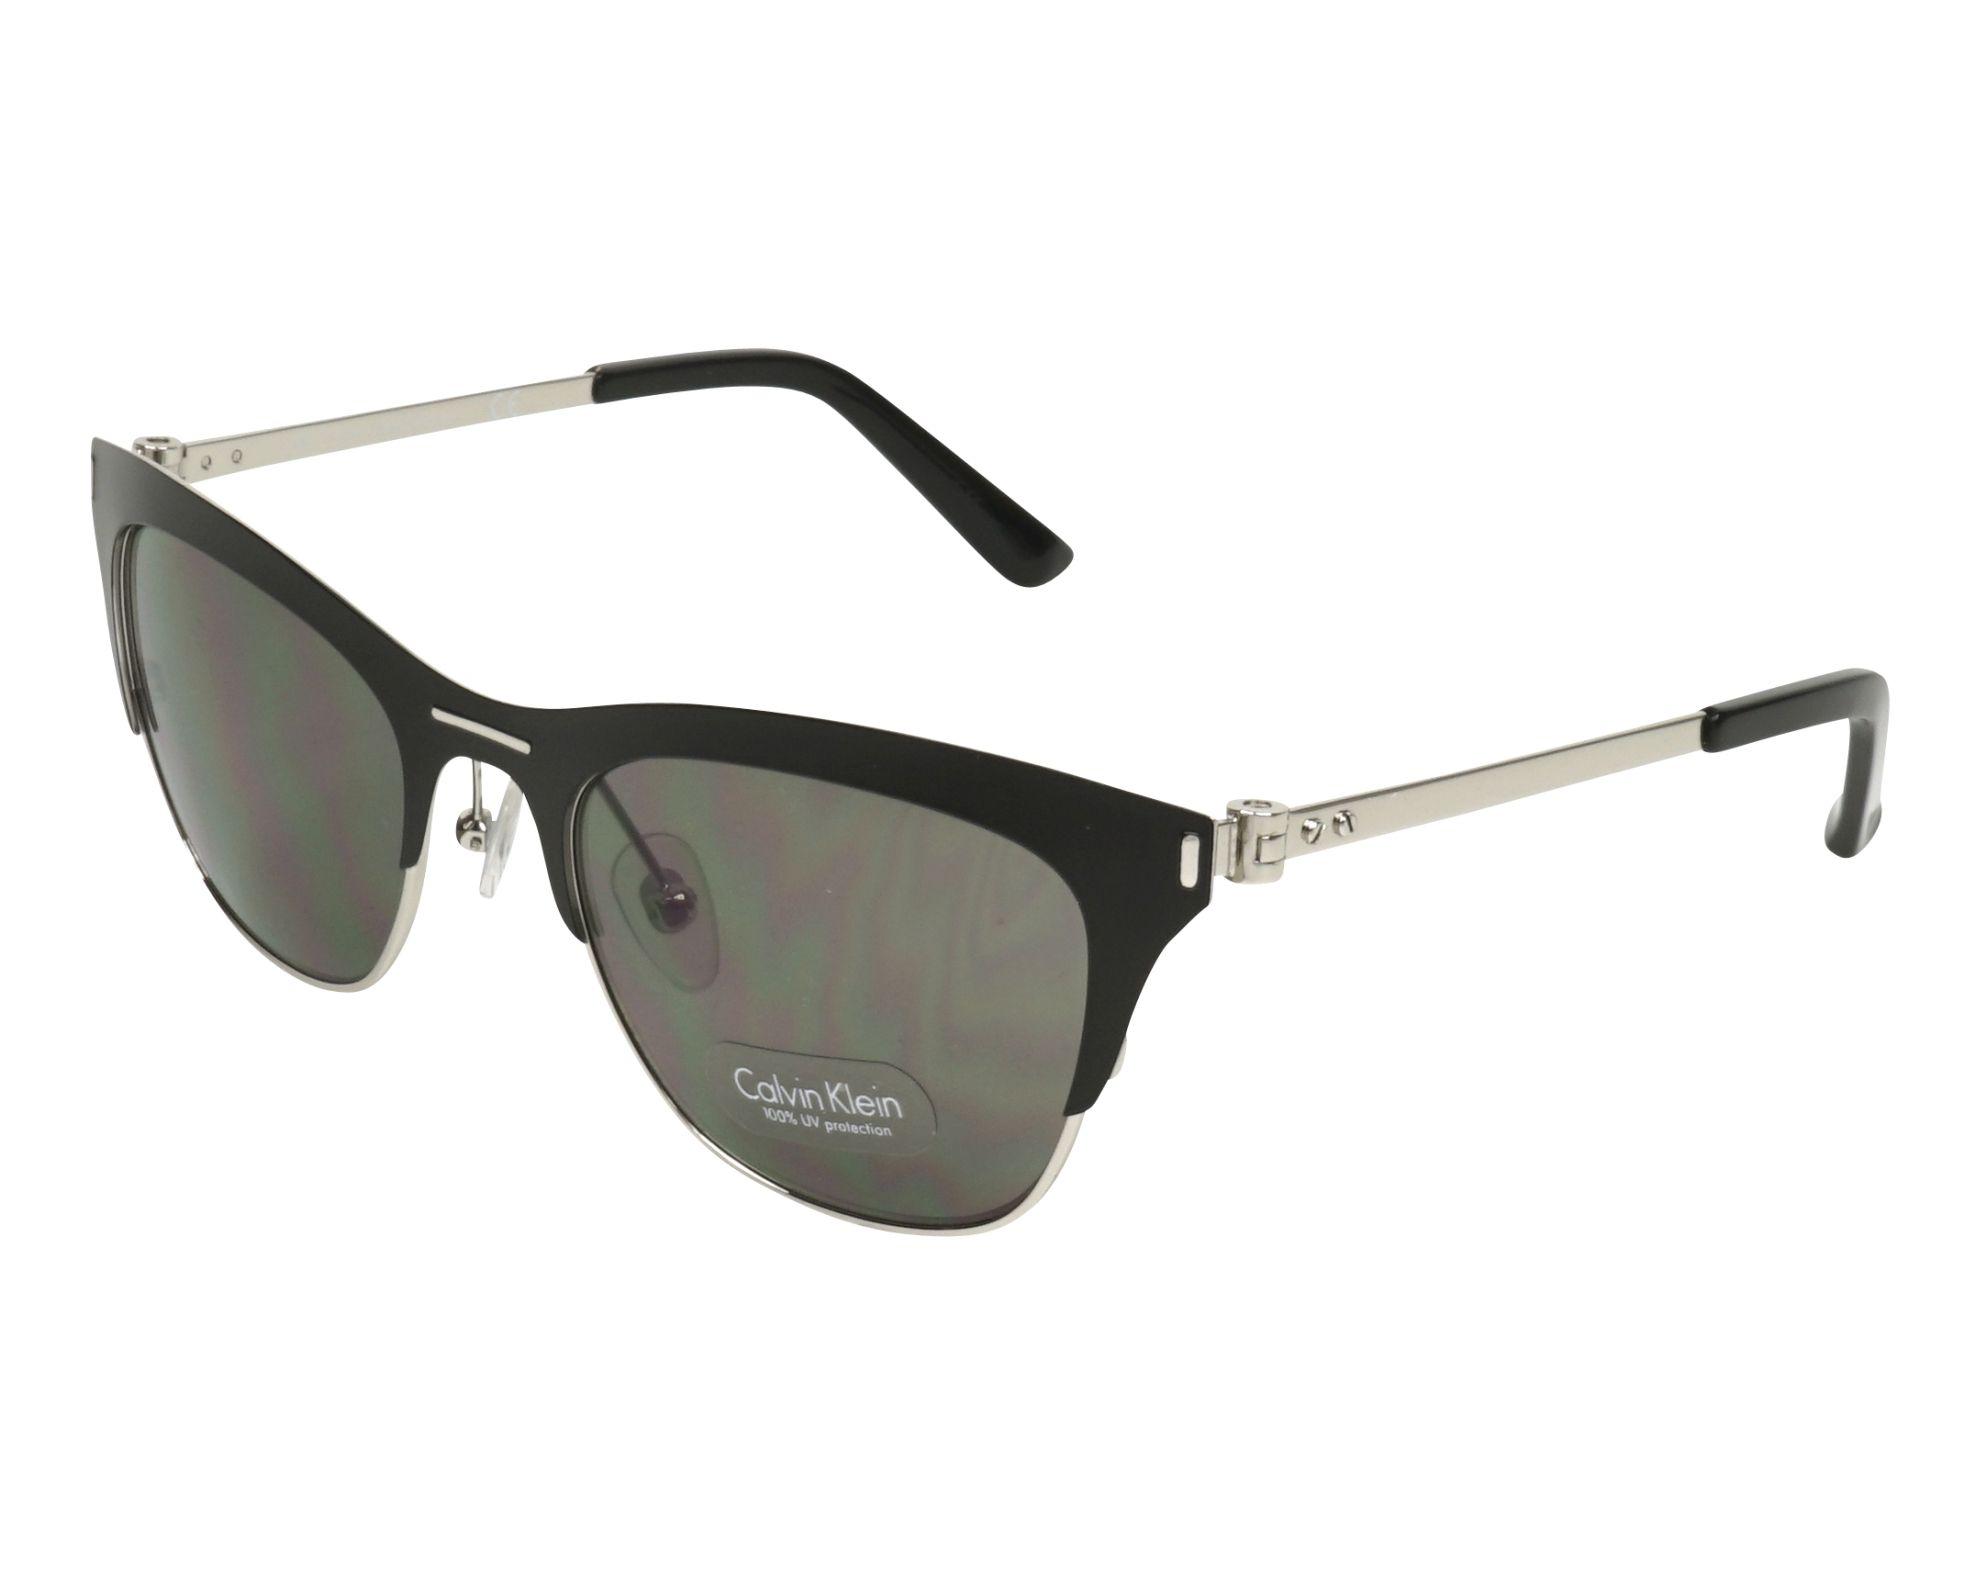 eab38dc025 Gafas de sol Calvin Klein CK-8005-S 001 53-20 Negra Plata